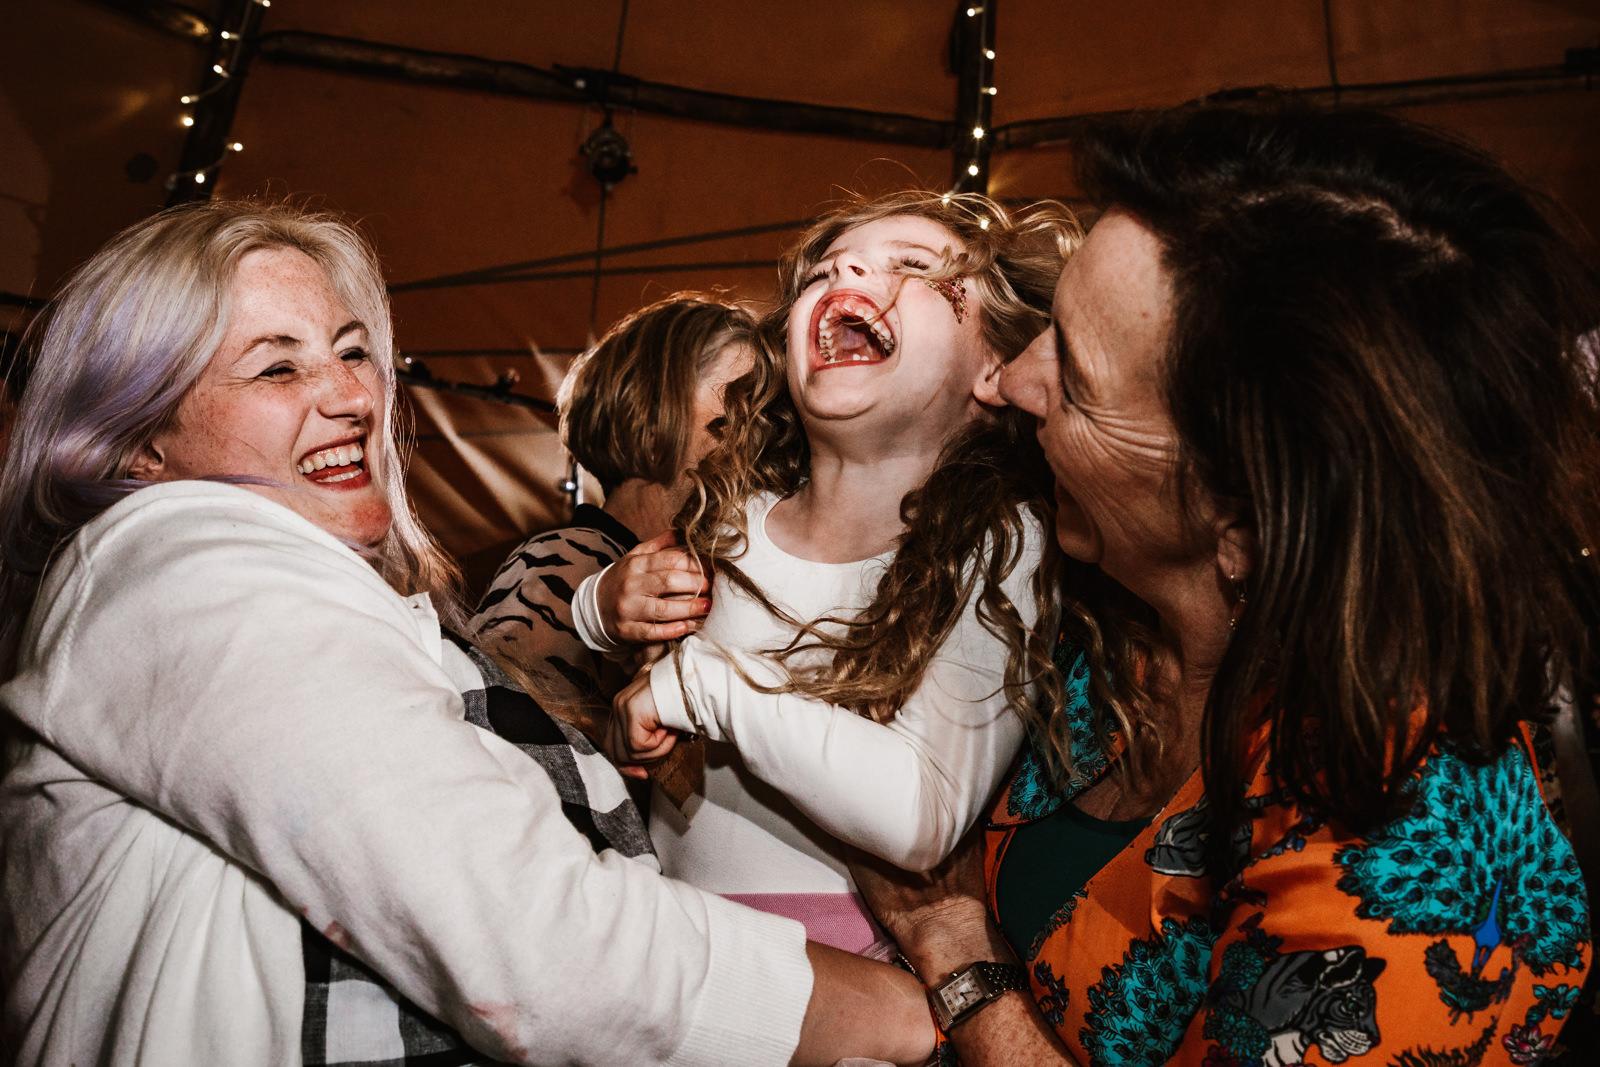 little girl having fun on the dance floor